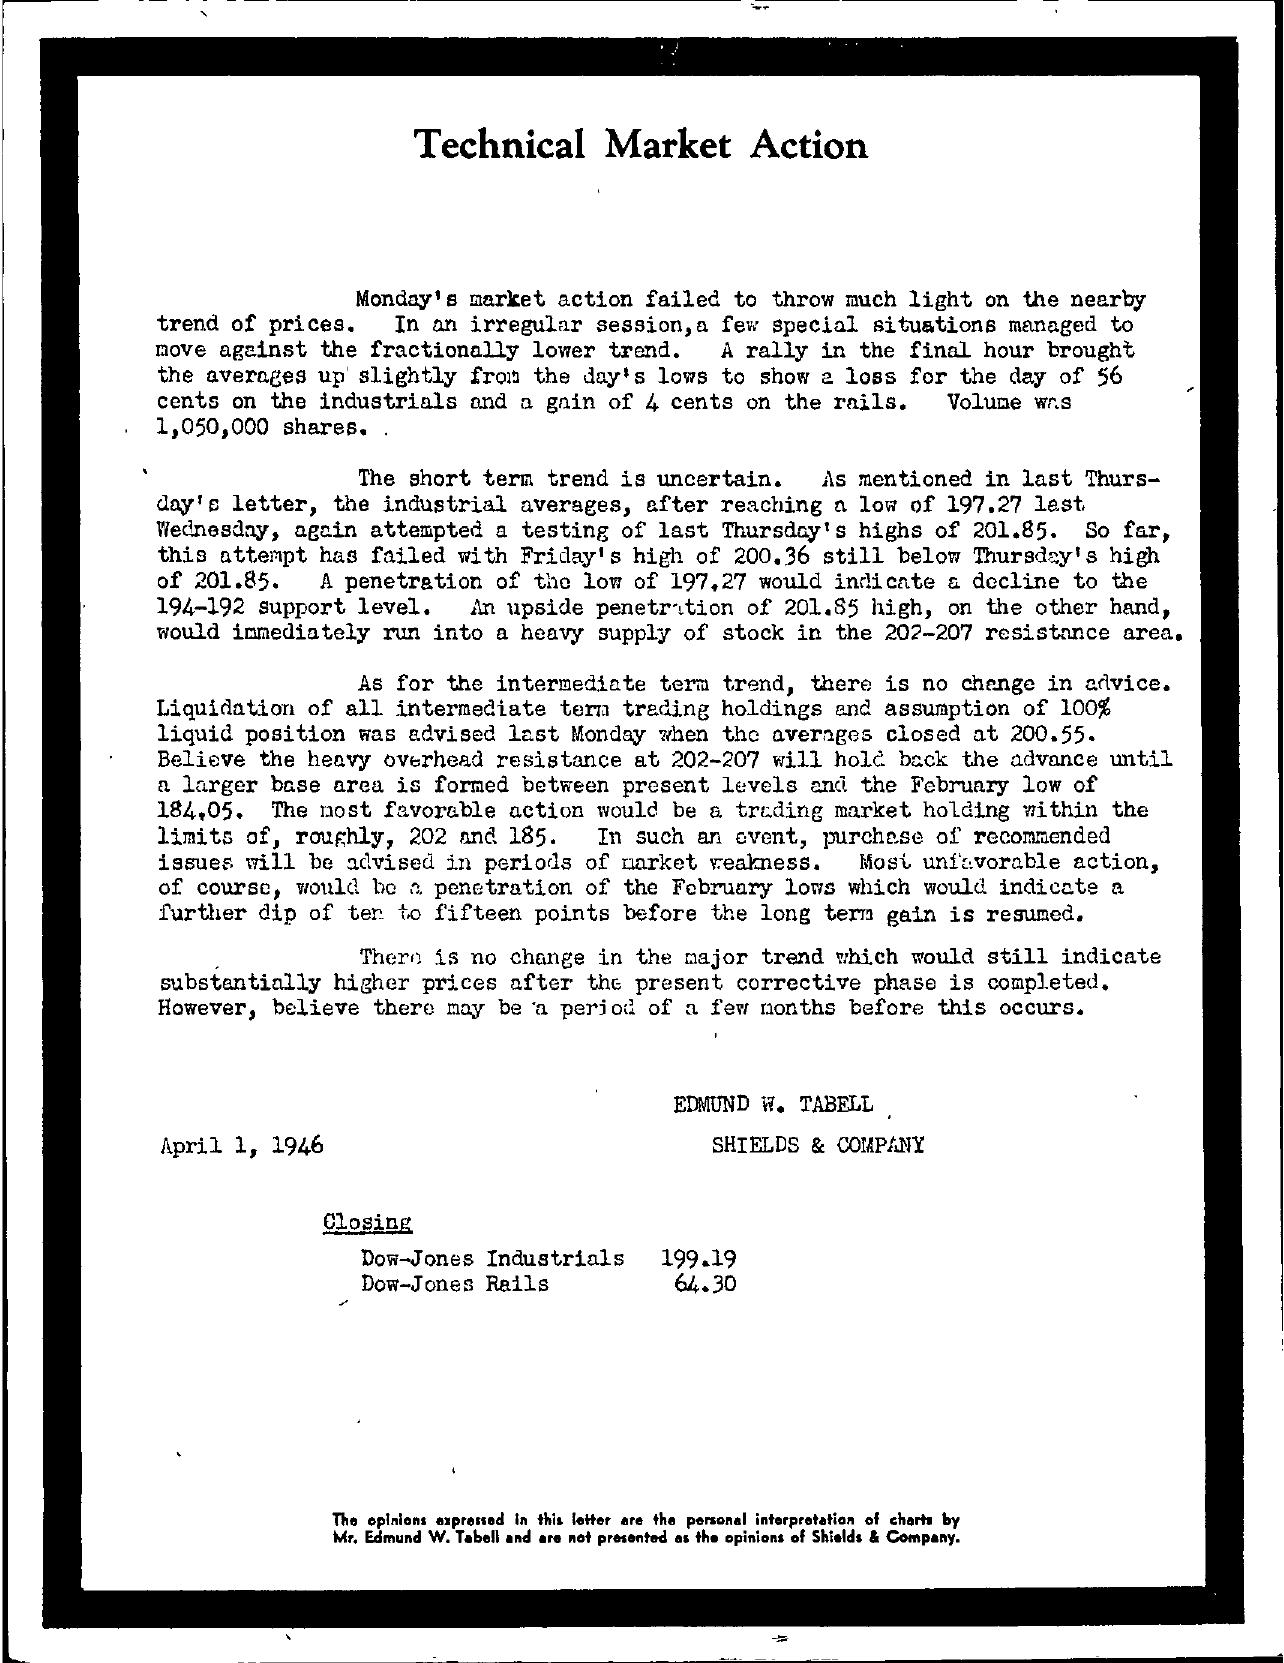 Tabell's Market Letter - April 01, 1946